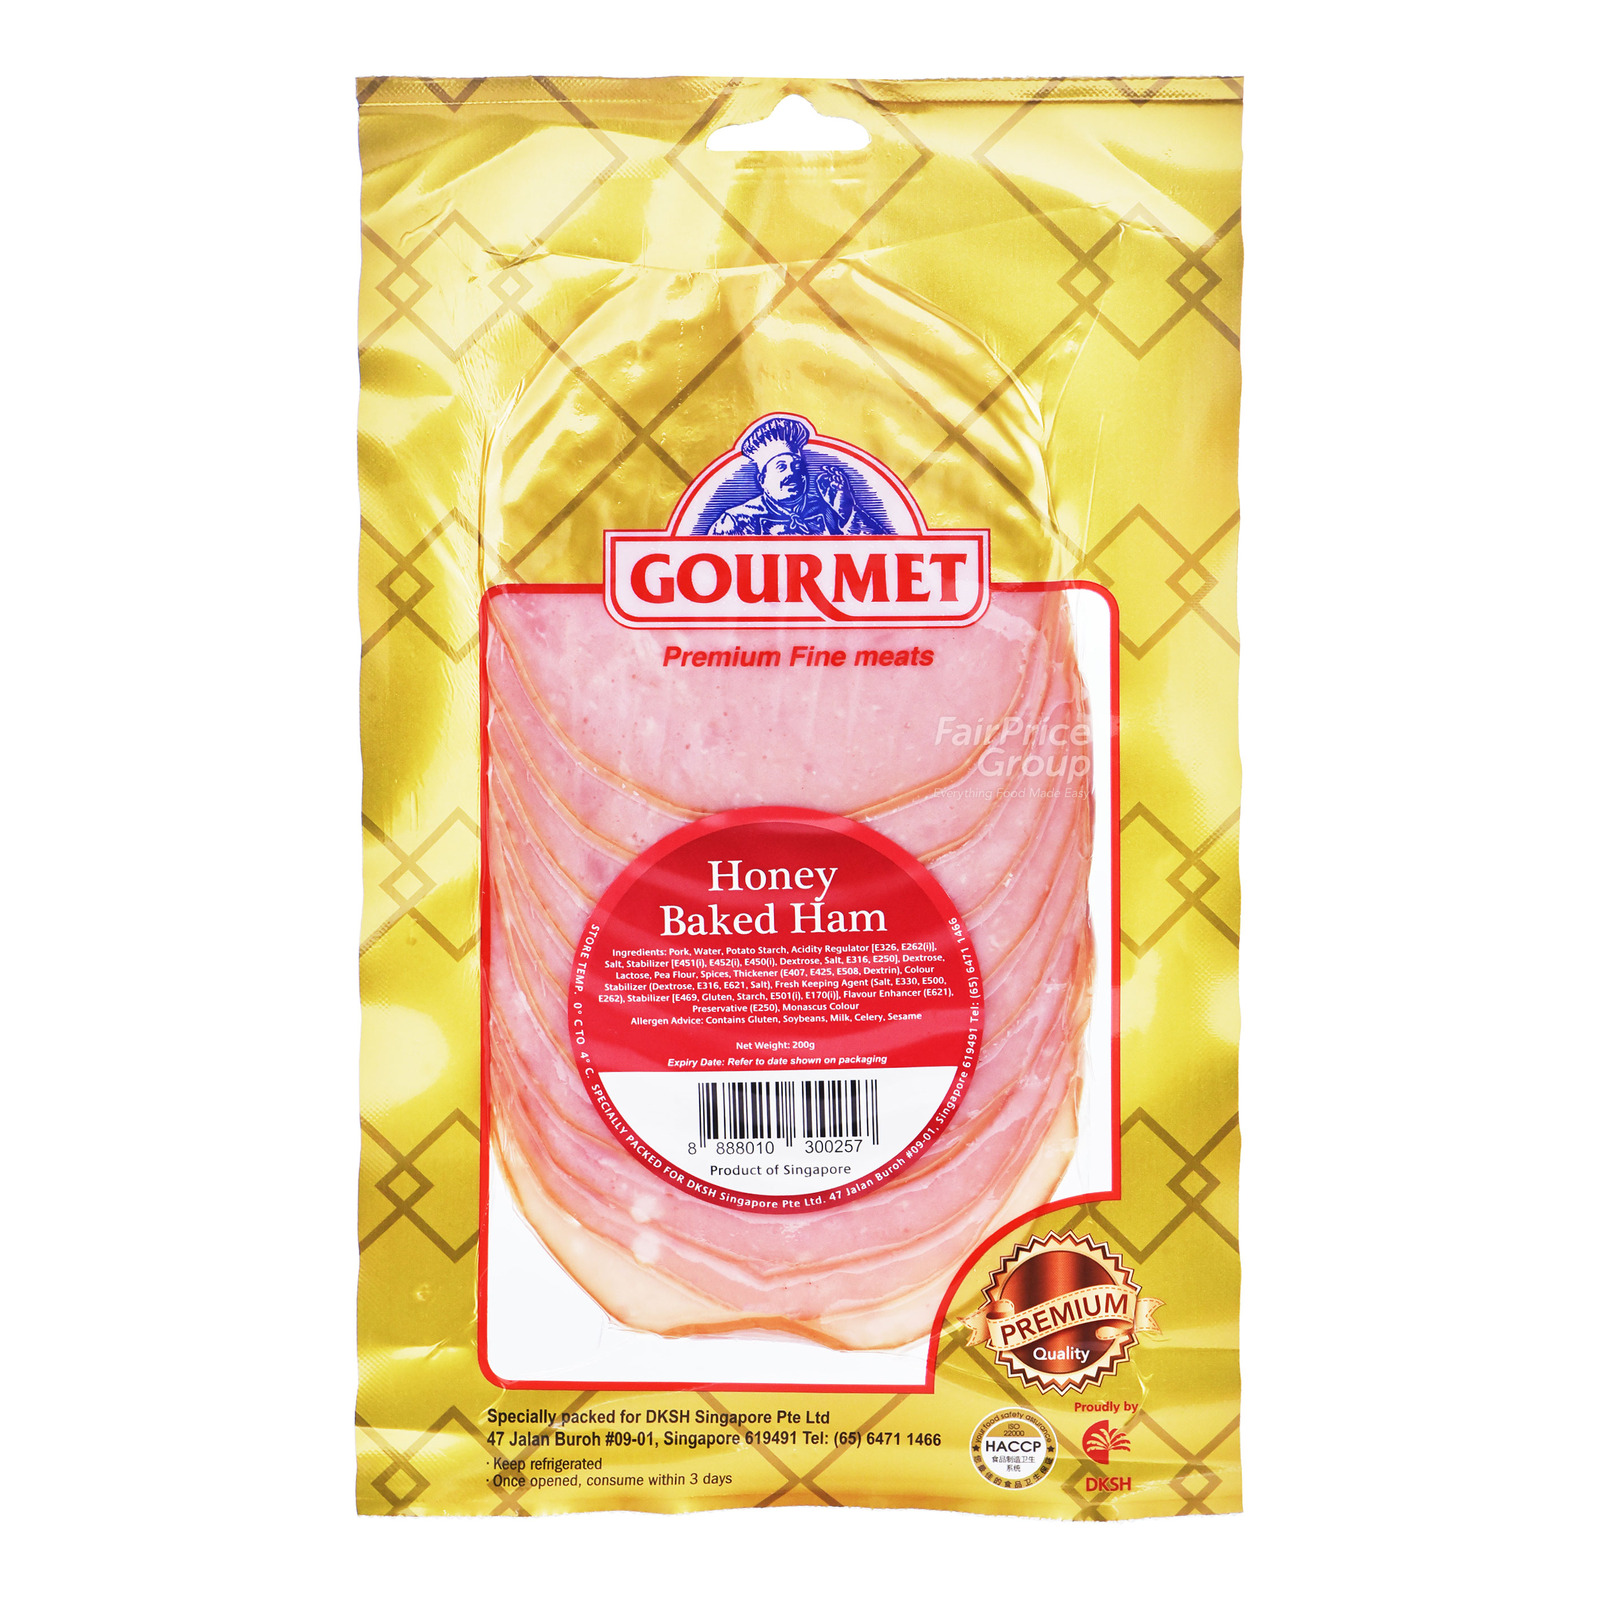 Gourmet Honey Baked Ham